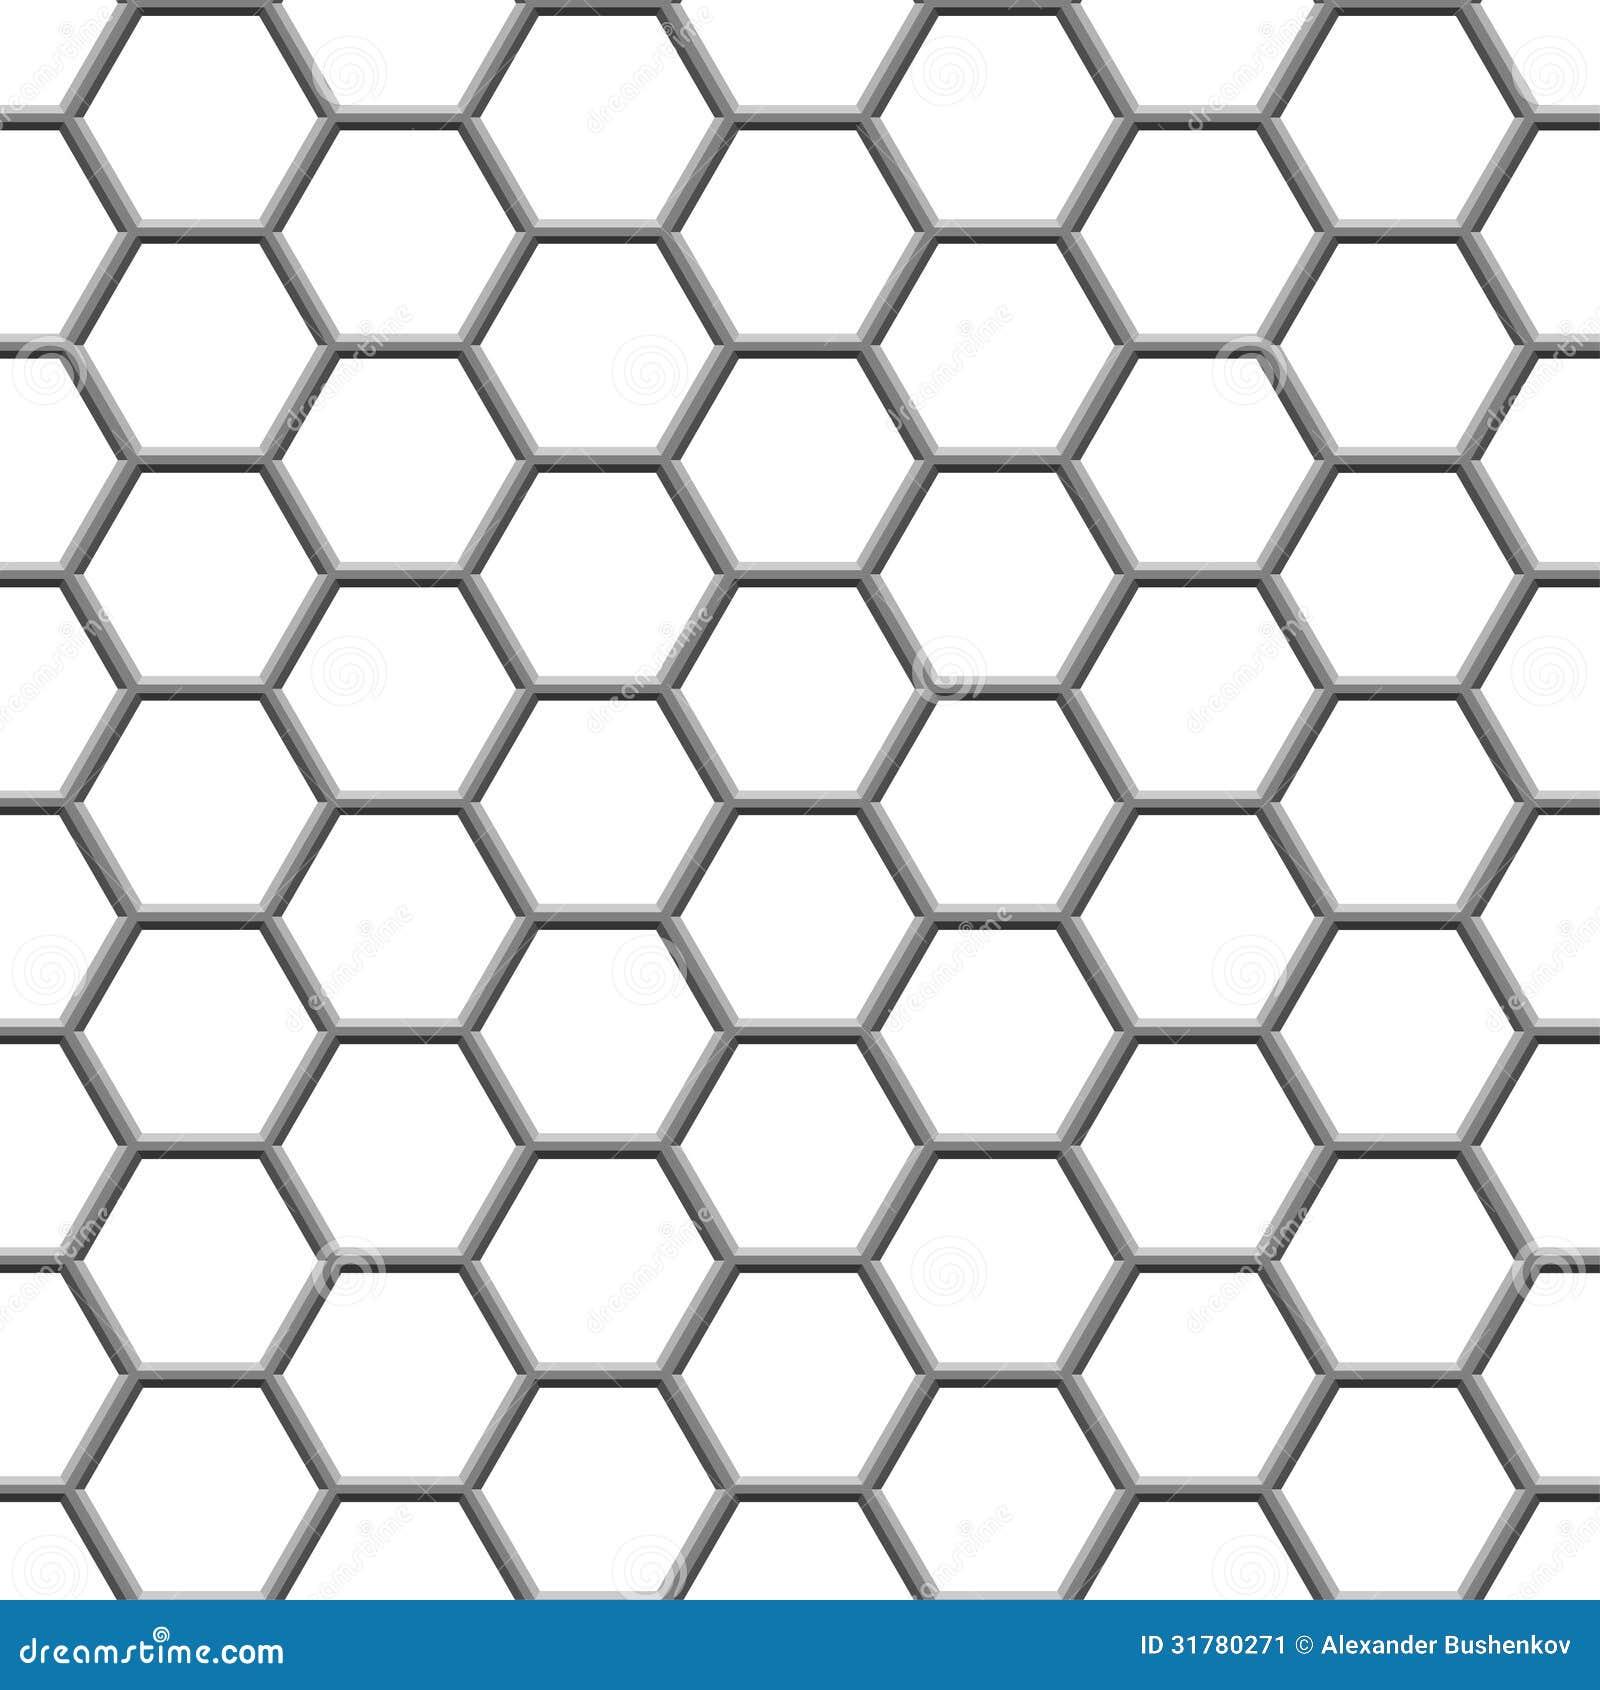 Hexagonal Grid Stock Image Image 31780271